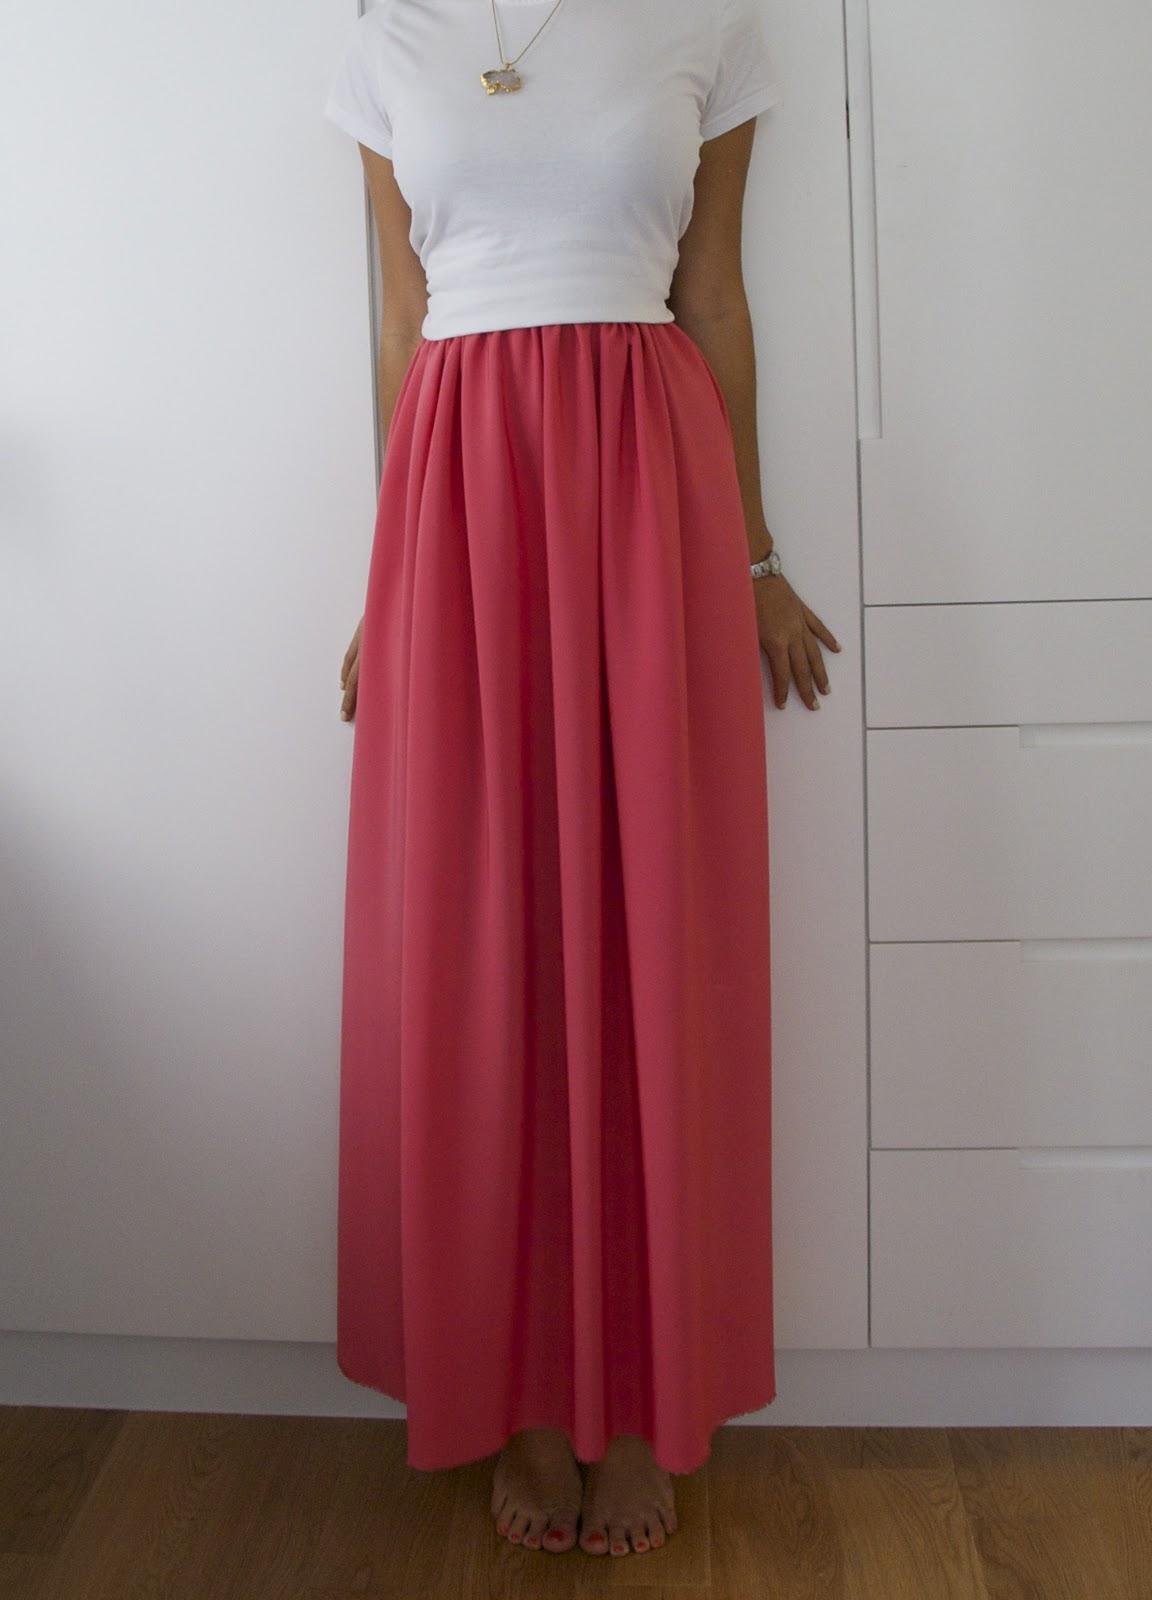 diy weekly jil sander inspired bright pink maxi skirt